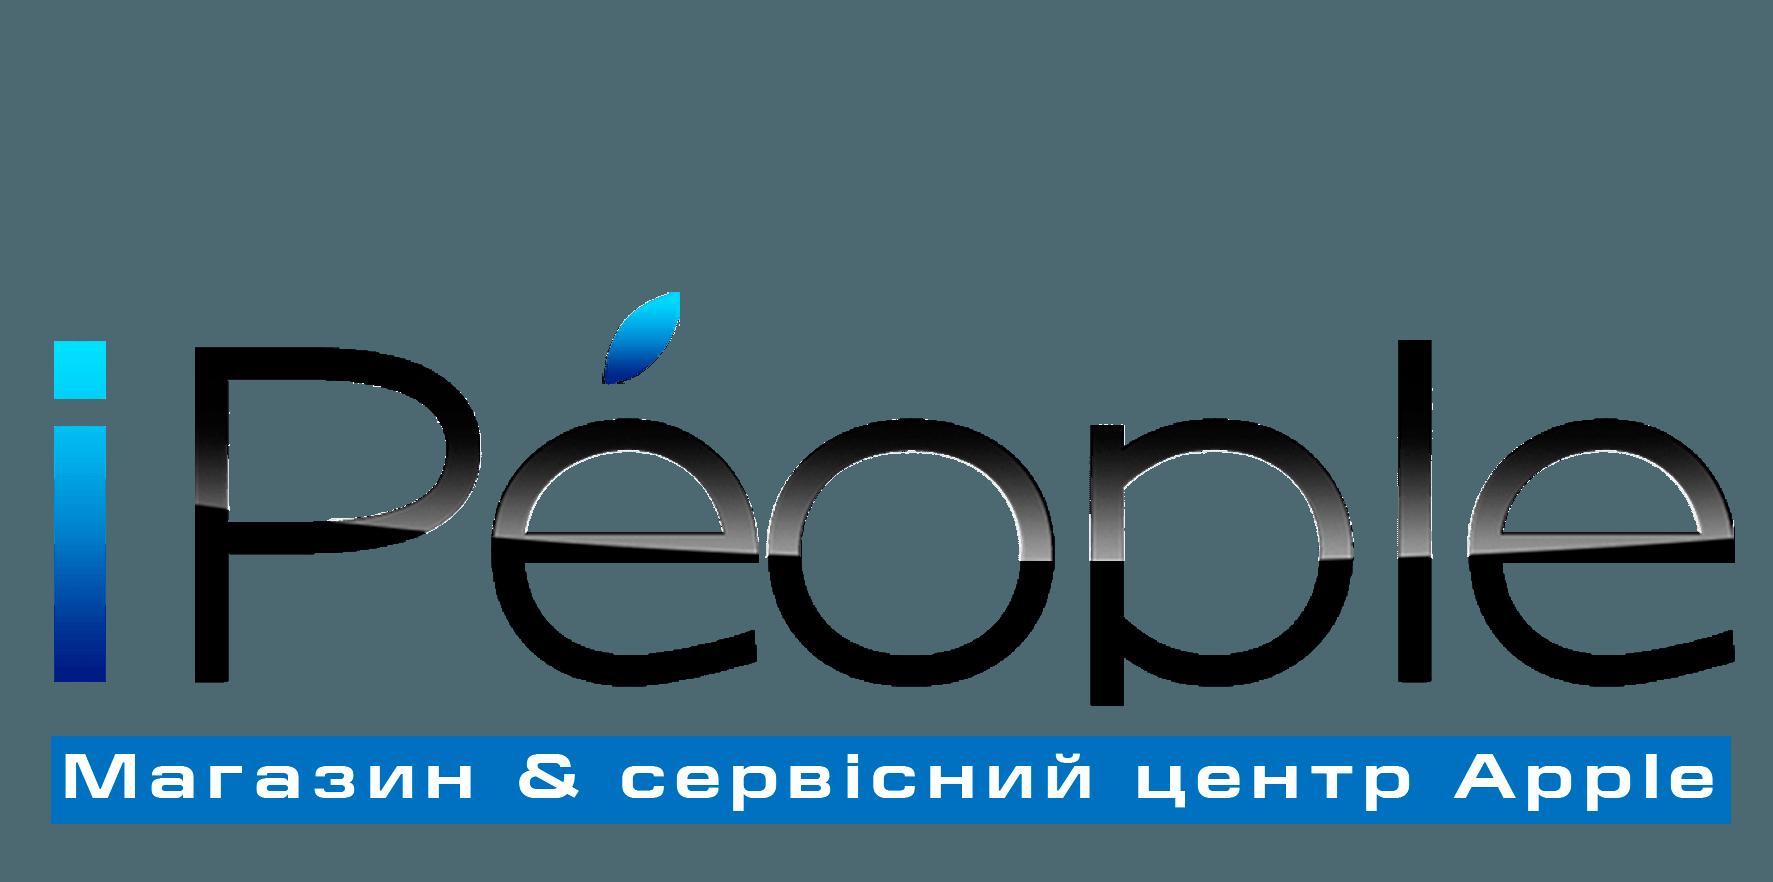 Інтернет-магазин iPeople